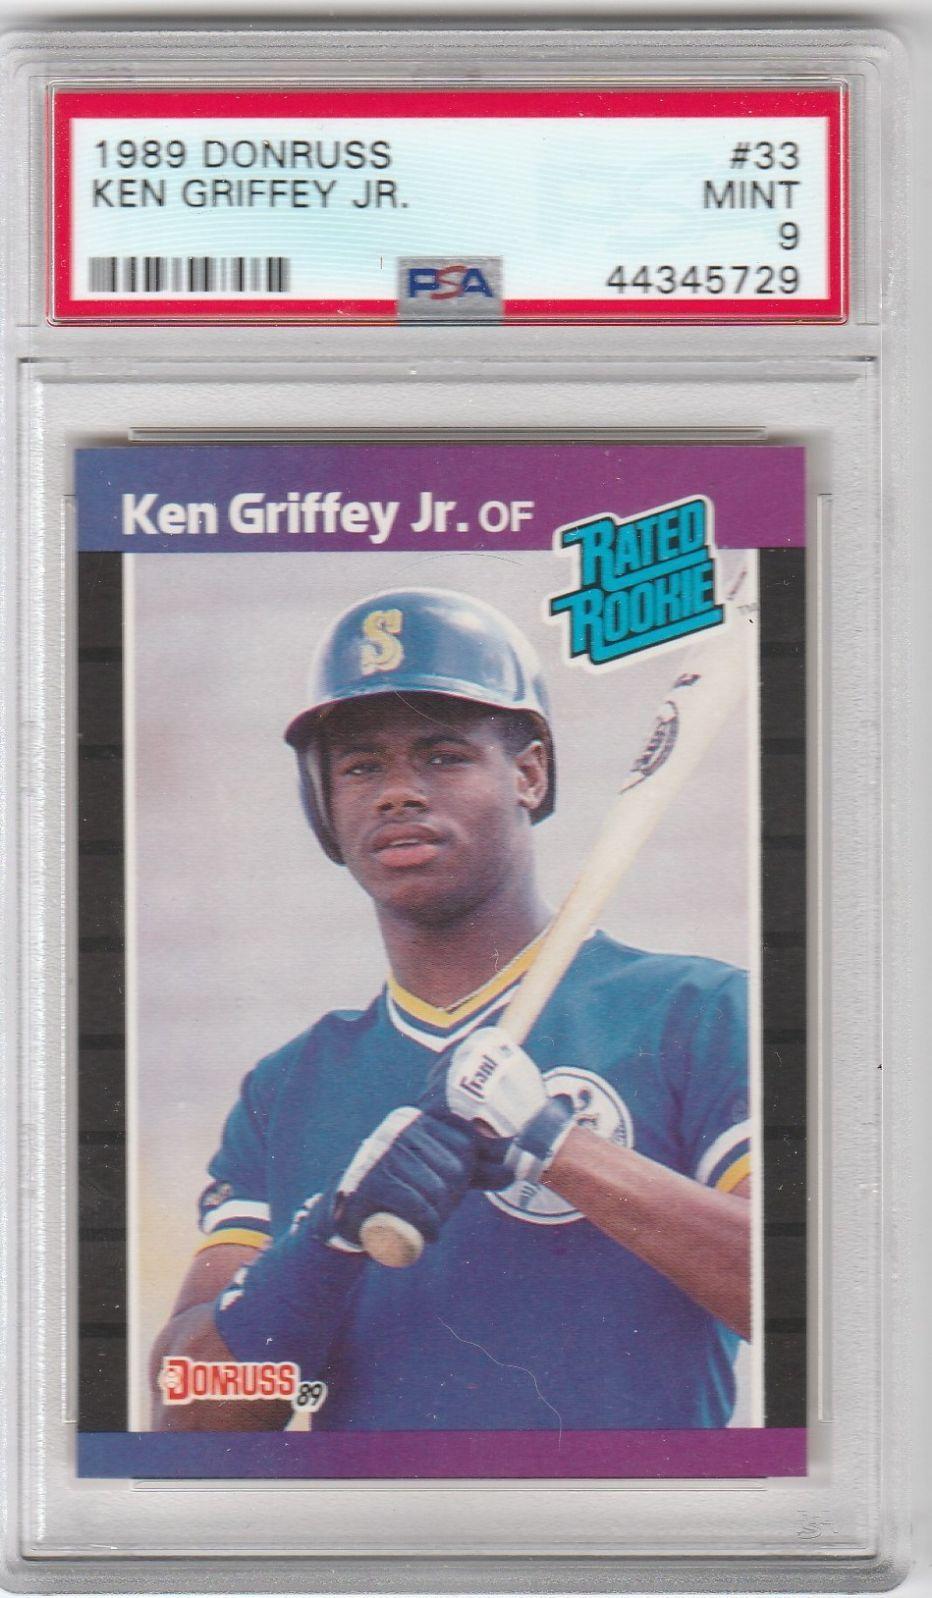 Psa 9 ken griffey jr rookie 1989 donruss mercari in 2020